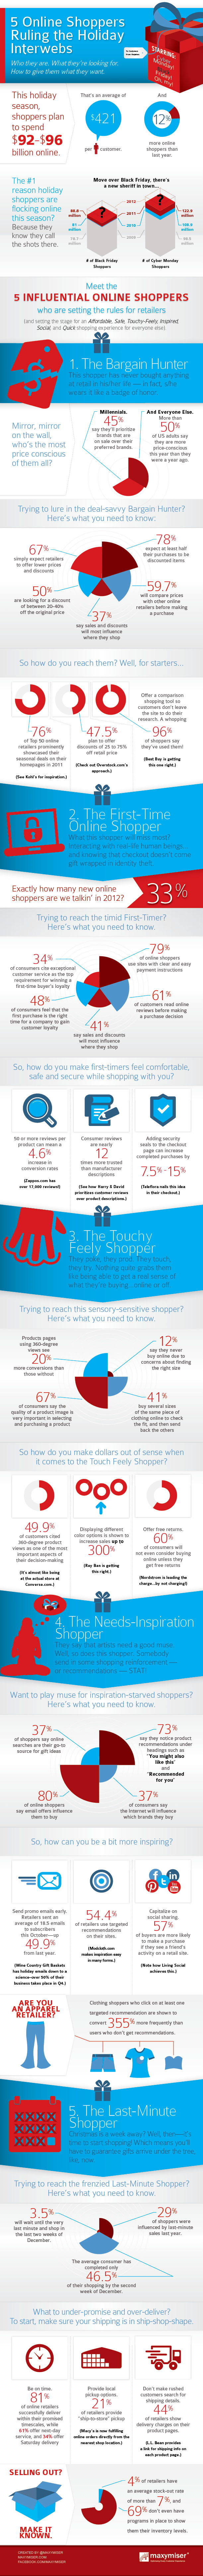 Christmas Shopper Types-Infographic